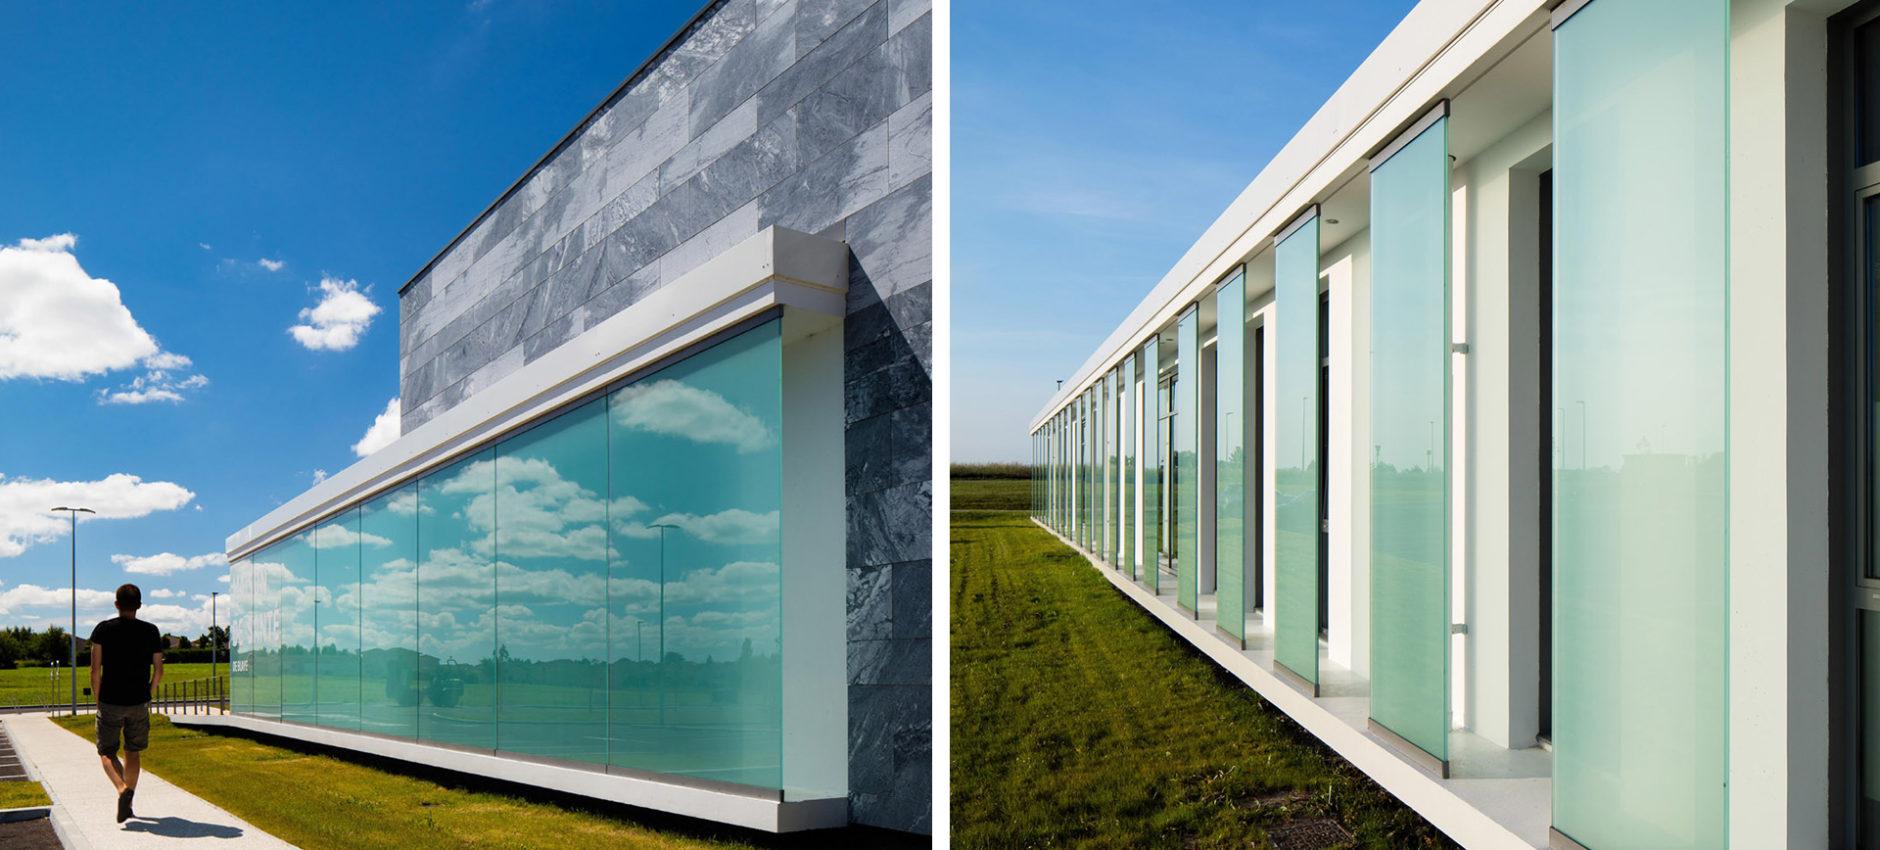 boca_architecture_projet_maison_sante_blaye_02.jpg